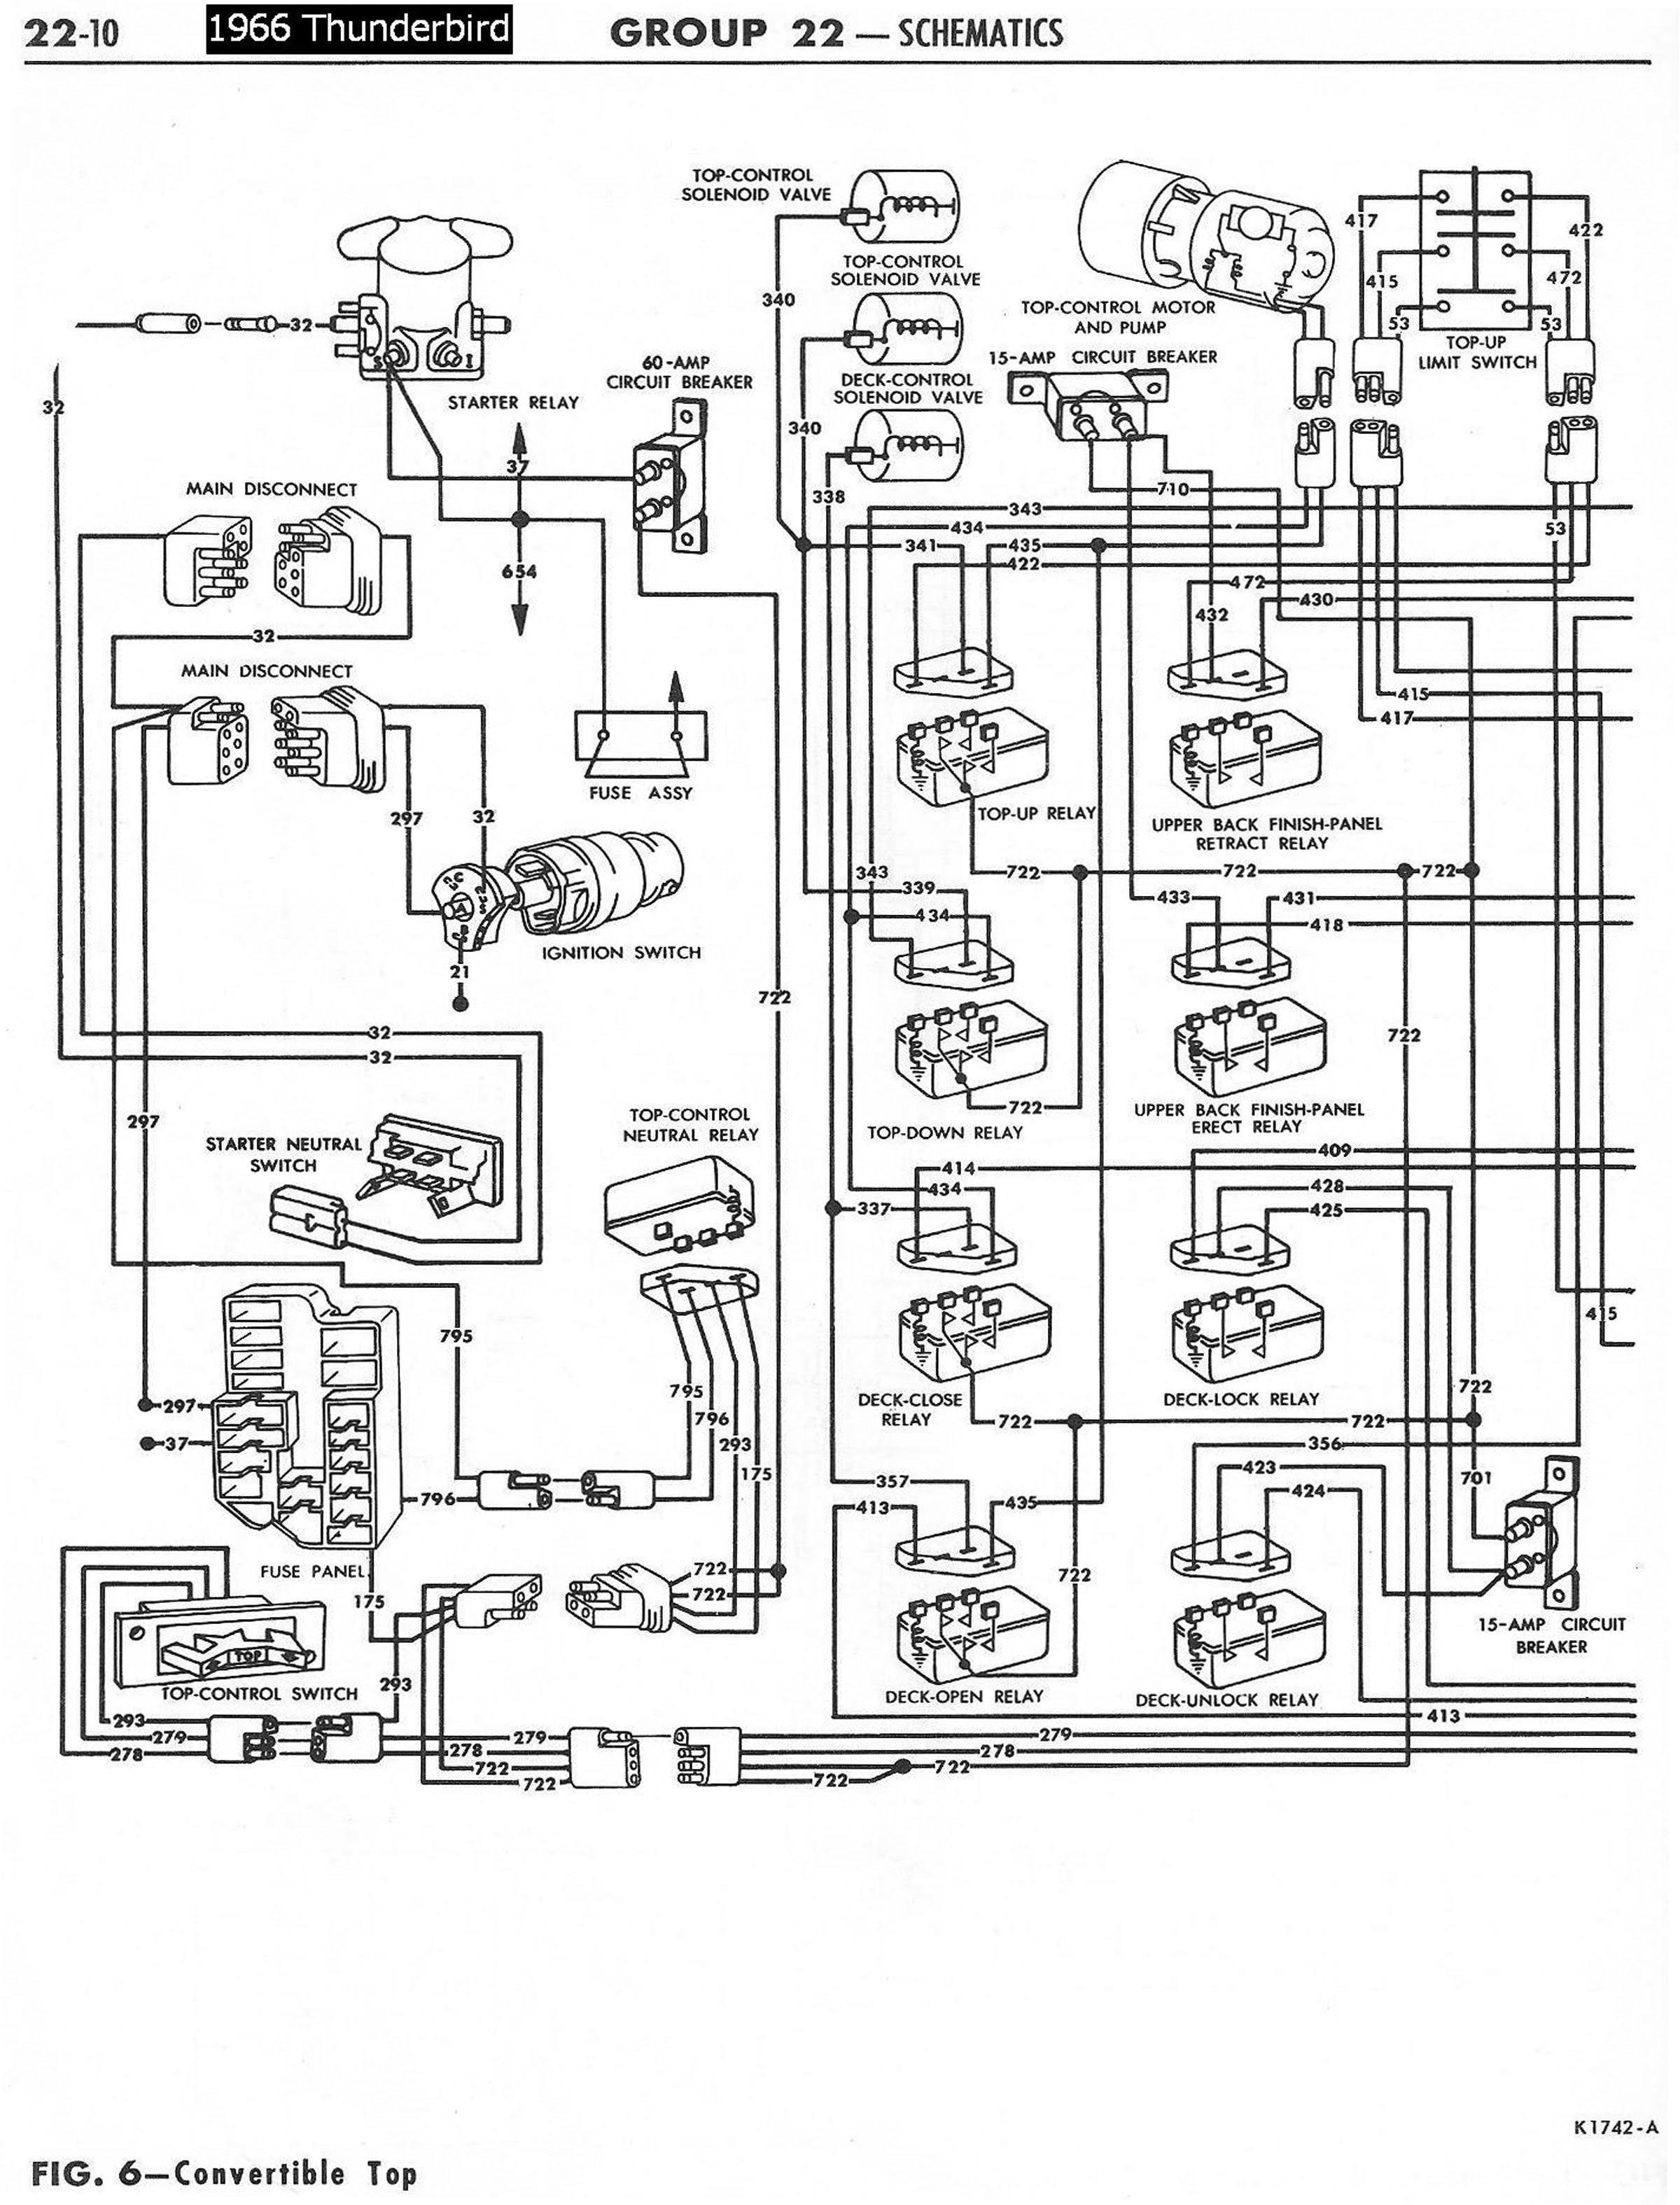 1958 Chevrolet Wiring Diagram